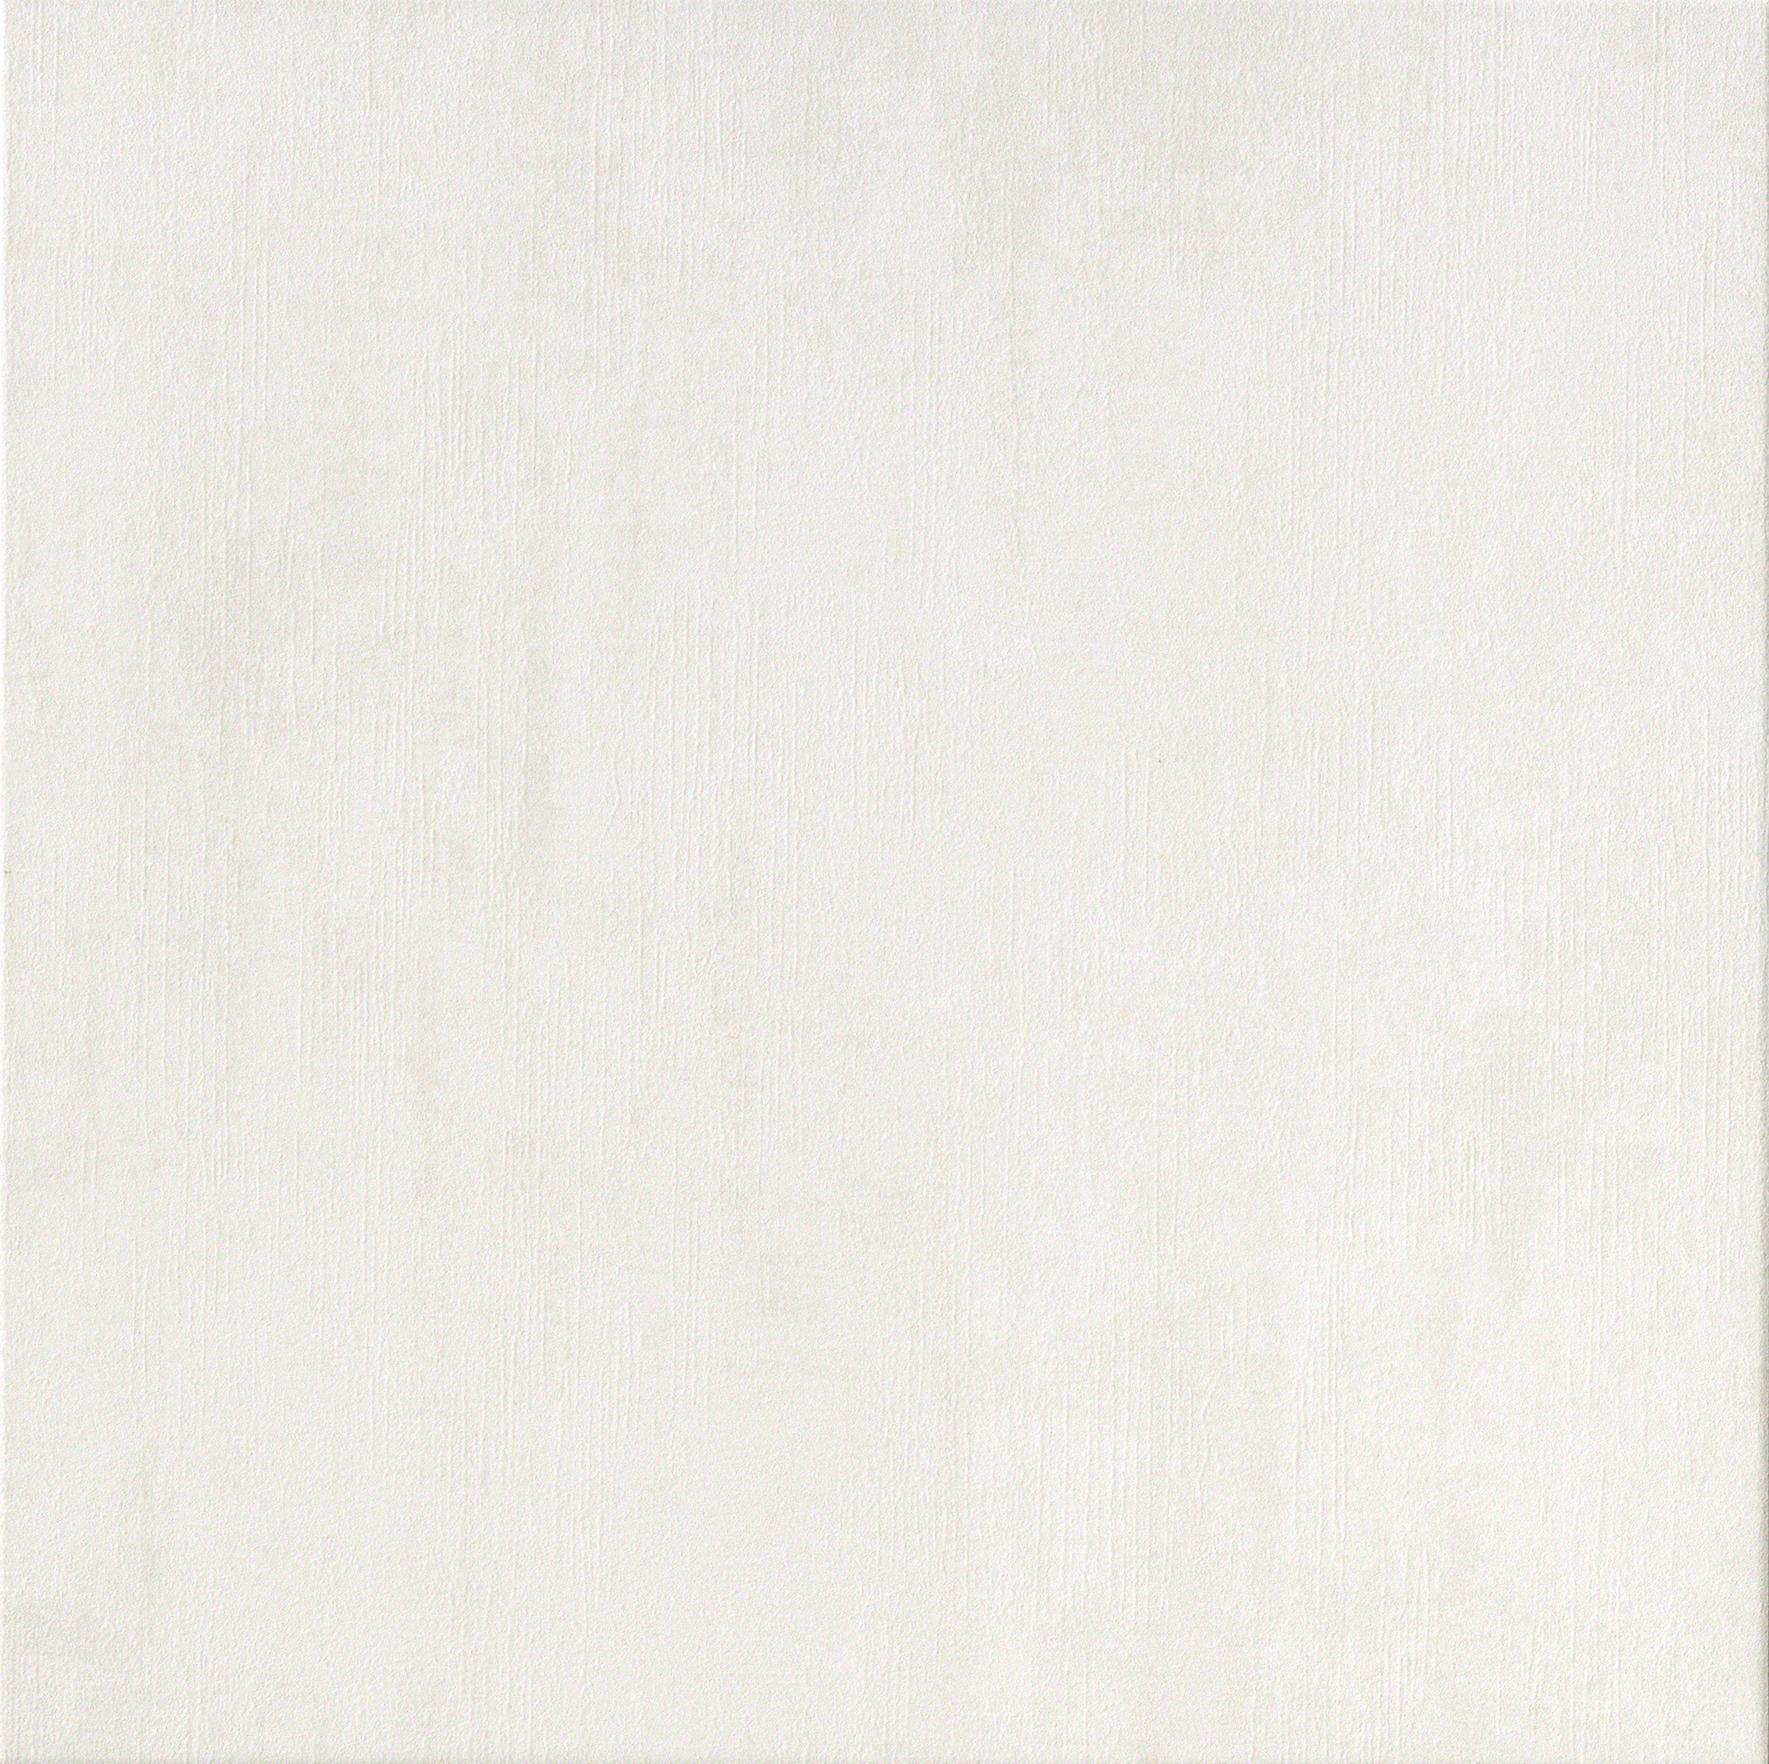 Made White Ceramic Tiles From Ascot Ceramiche Architonic